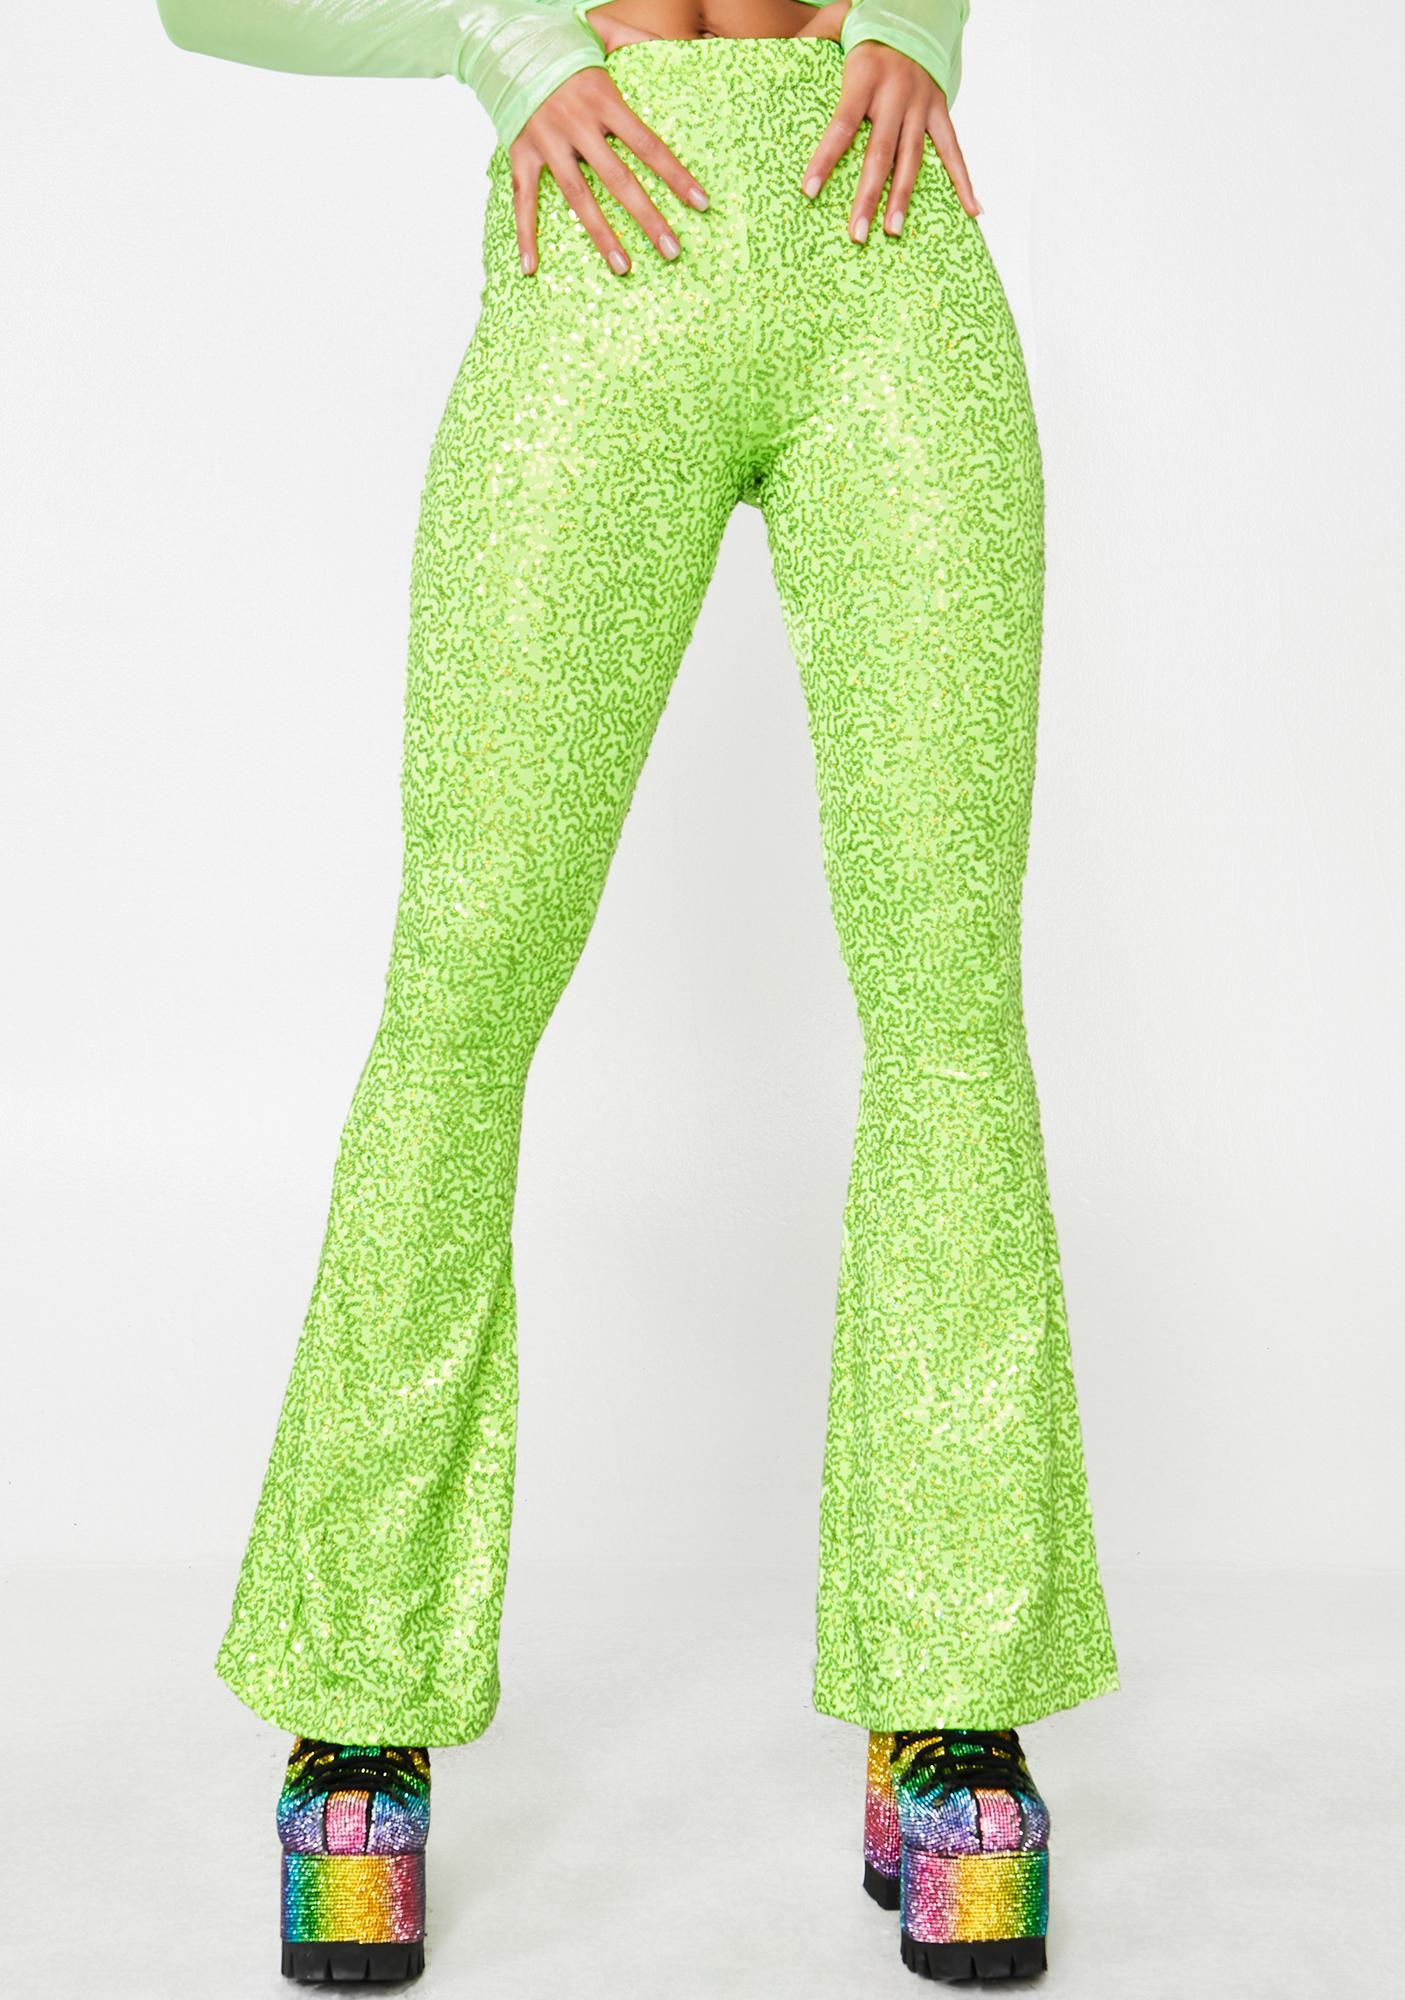 05c8b0385d5c78 Get Crooked Sequin Lycra High Waist Flares | Dolls Kill